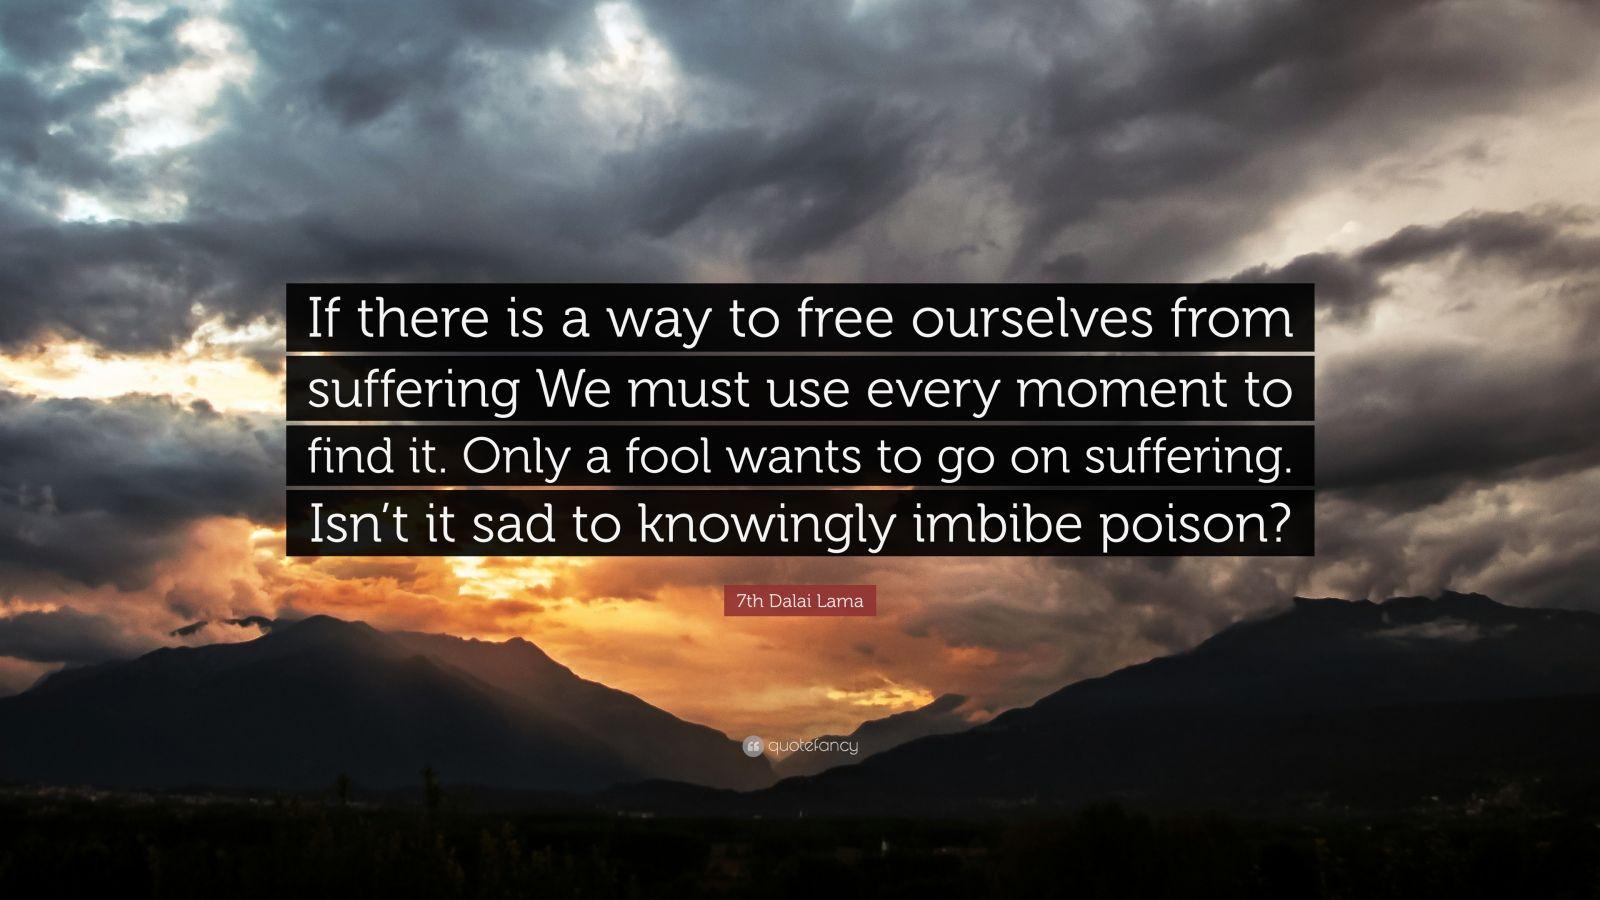 7th Dalai Lama Quotes (2 wallpapers) - Quotefancy